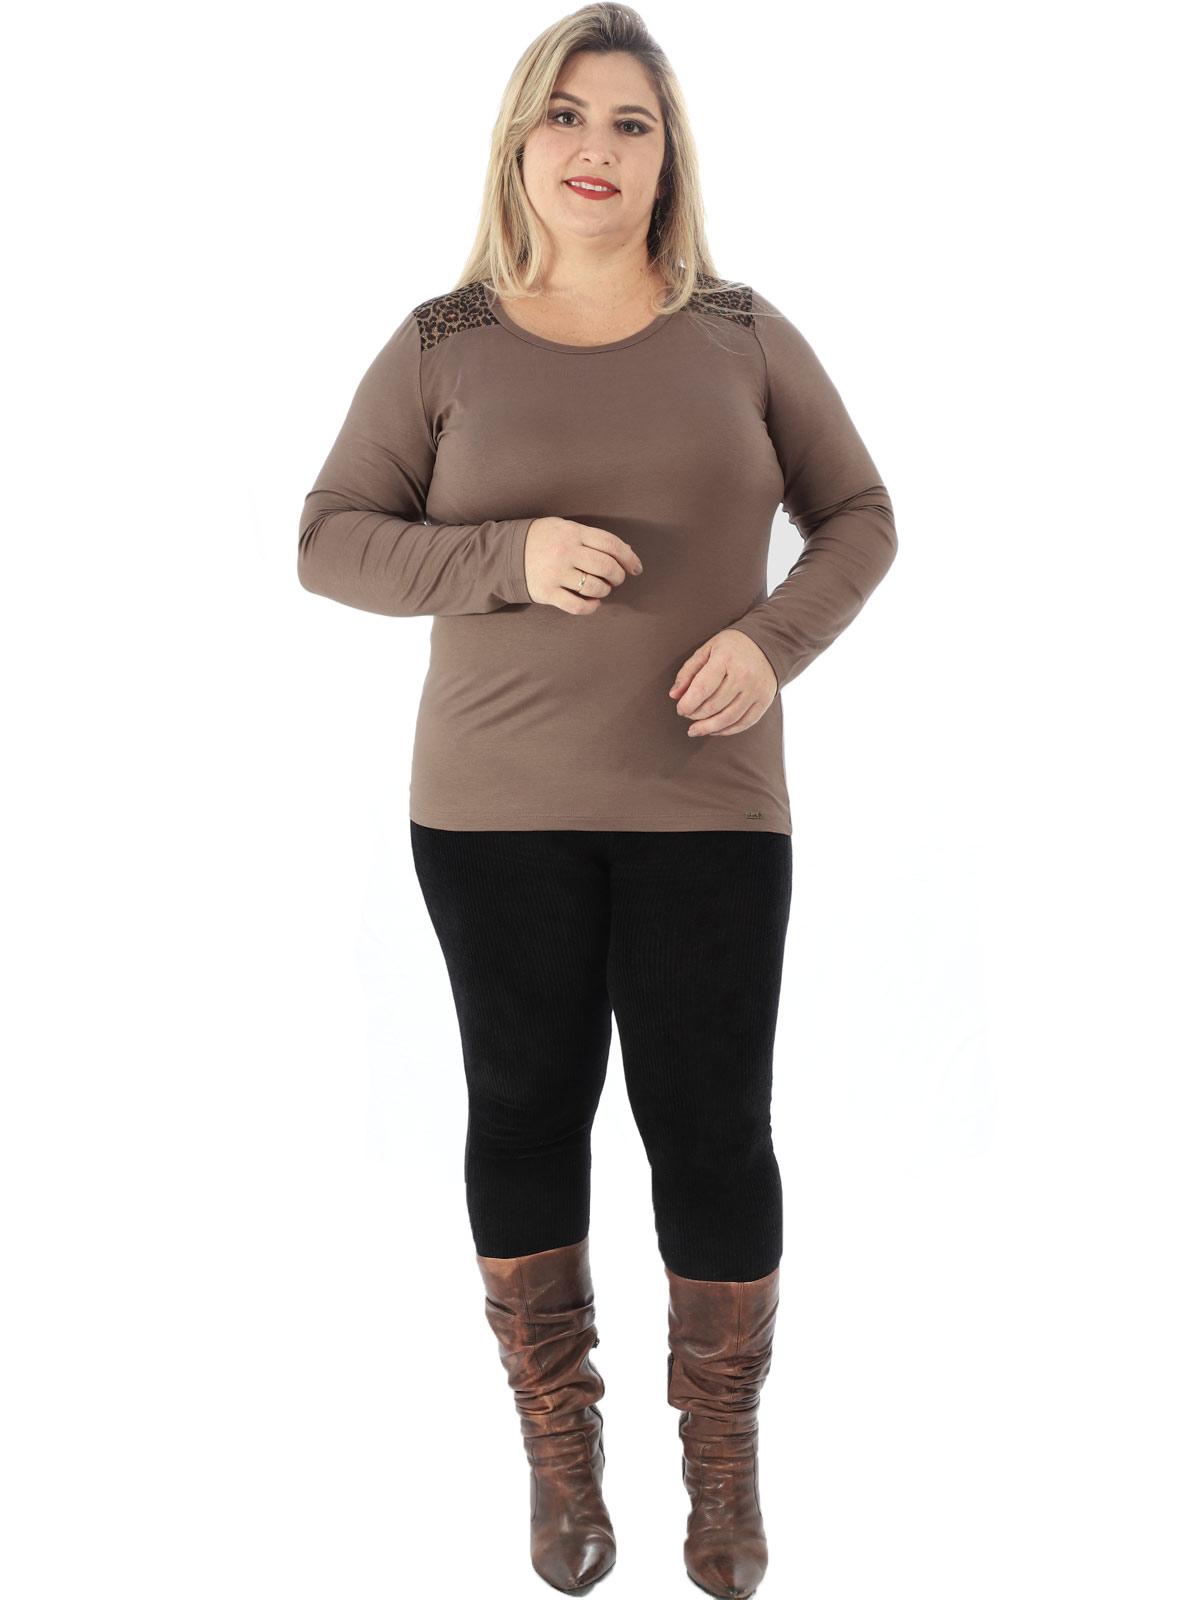 Blusa Plus Size Feminina Com Tule Estampado Anistia Terra